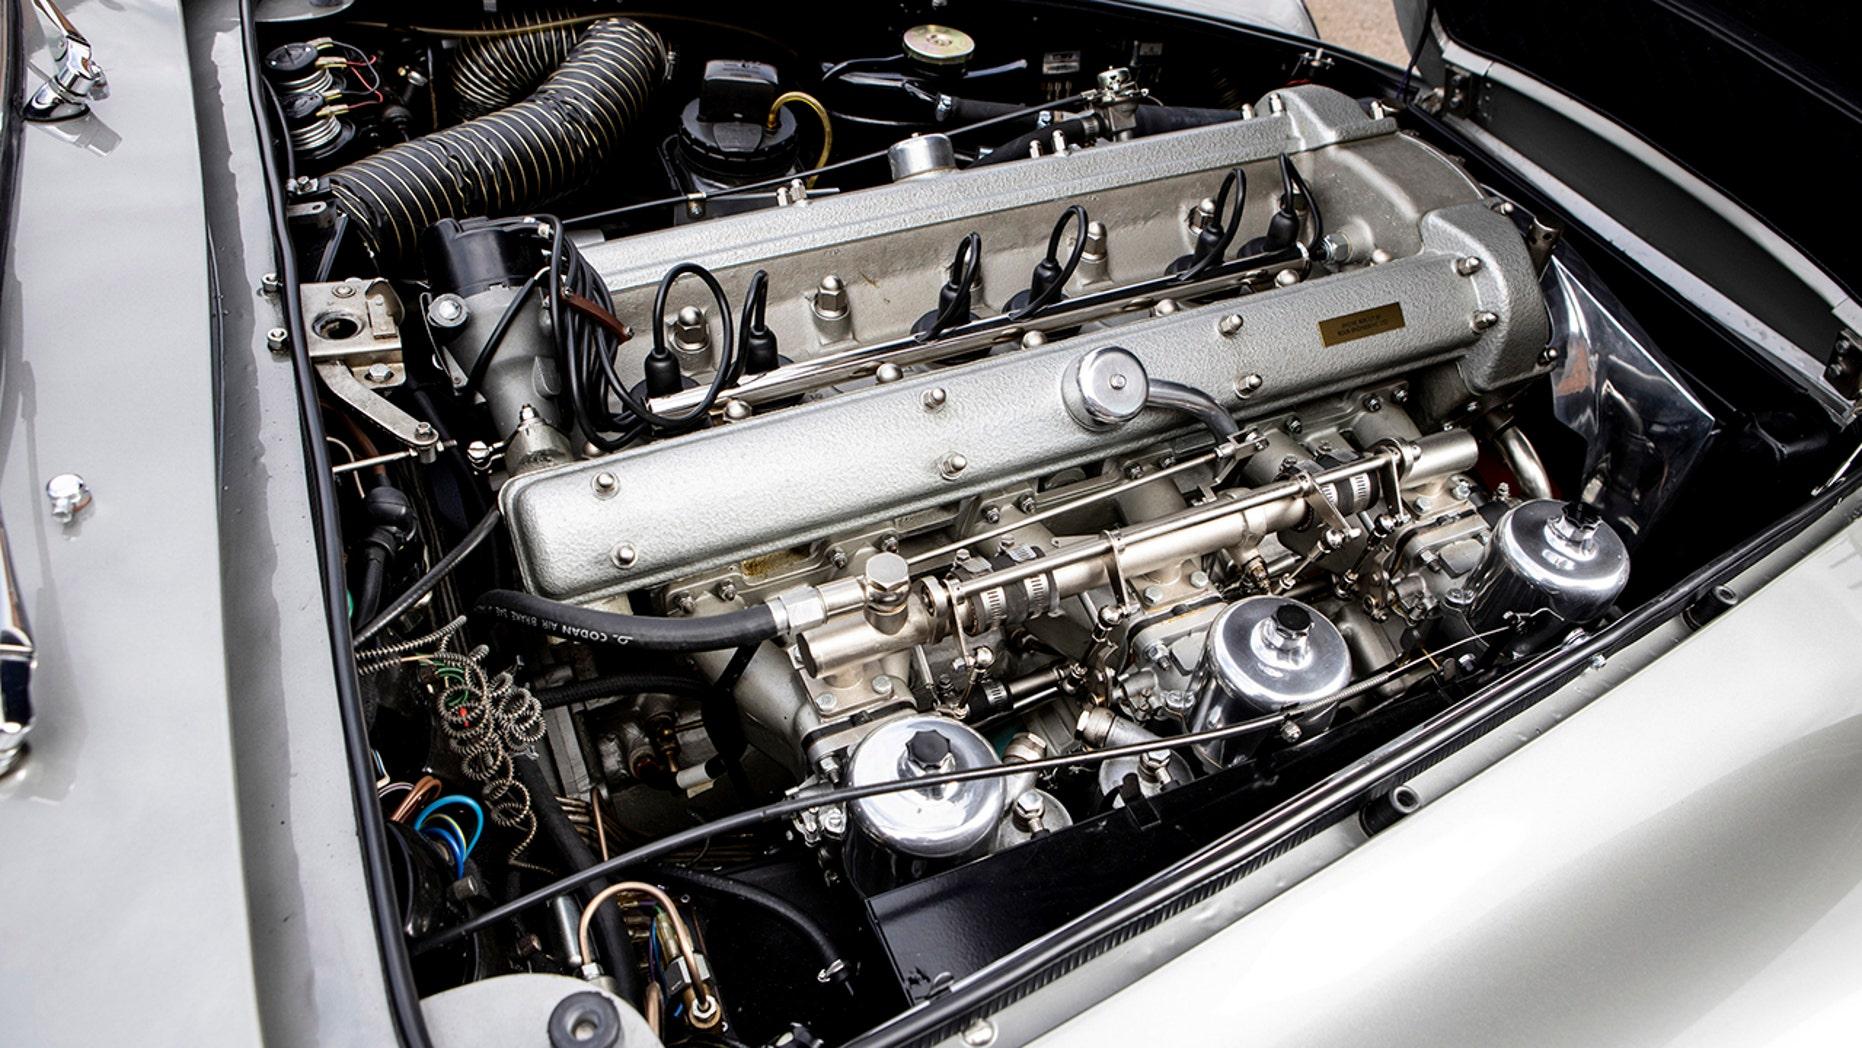 James Bond 007 Aston Martin DB5 engine